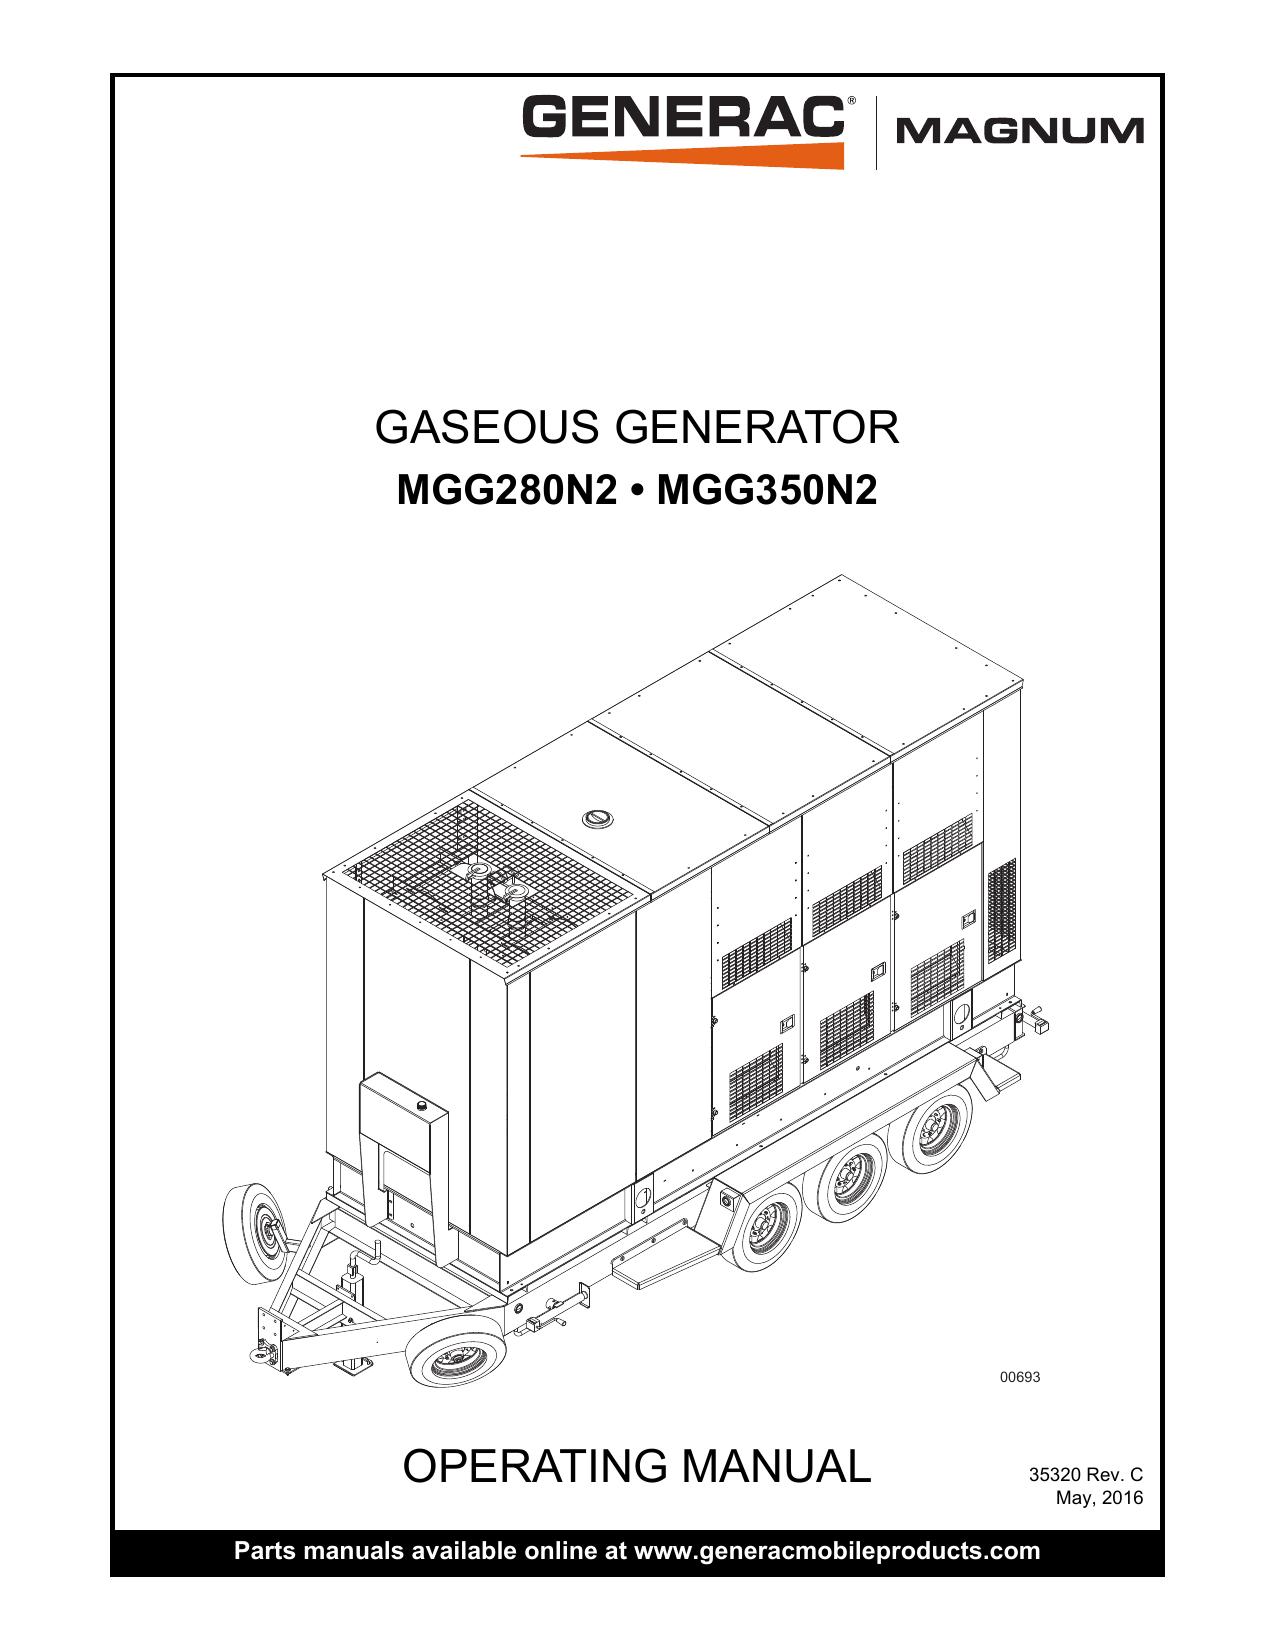 gaseous generator operating manual | manualzz.com on